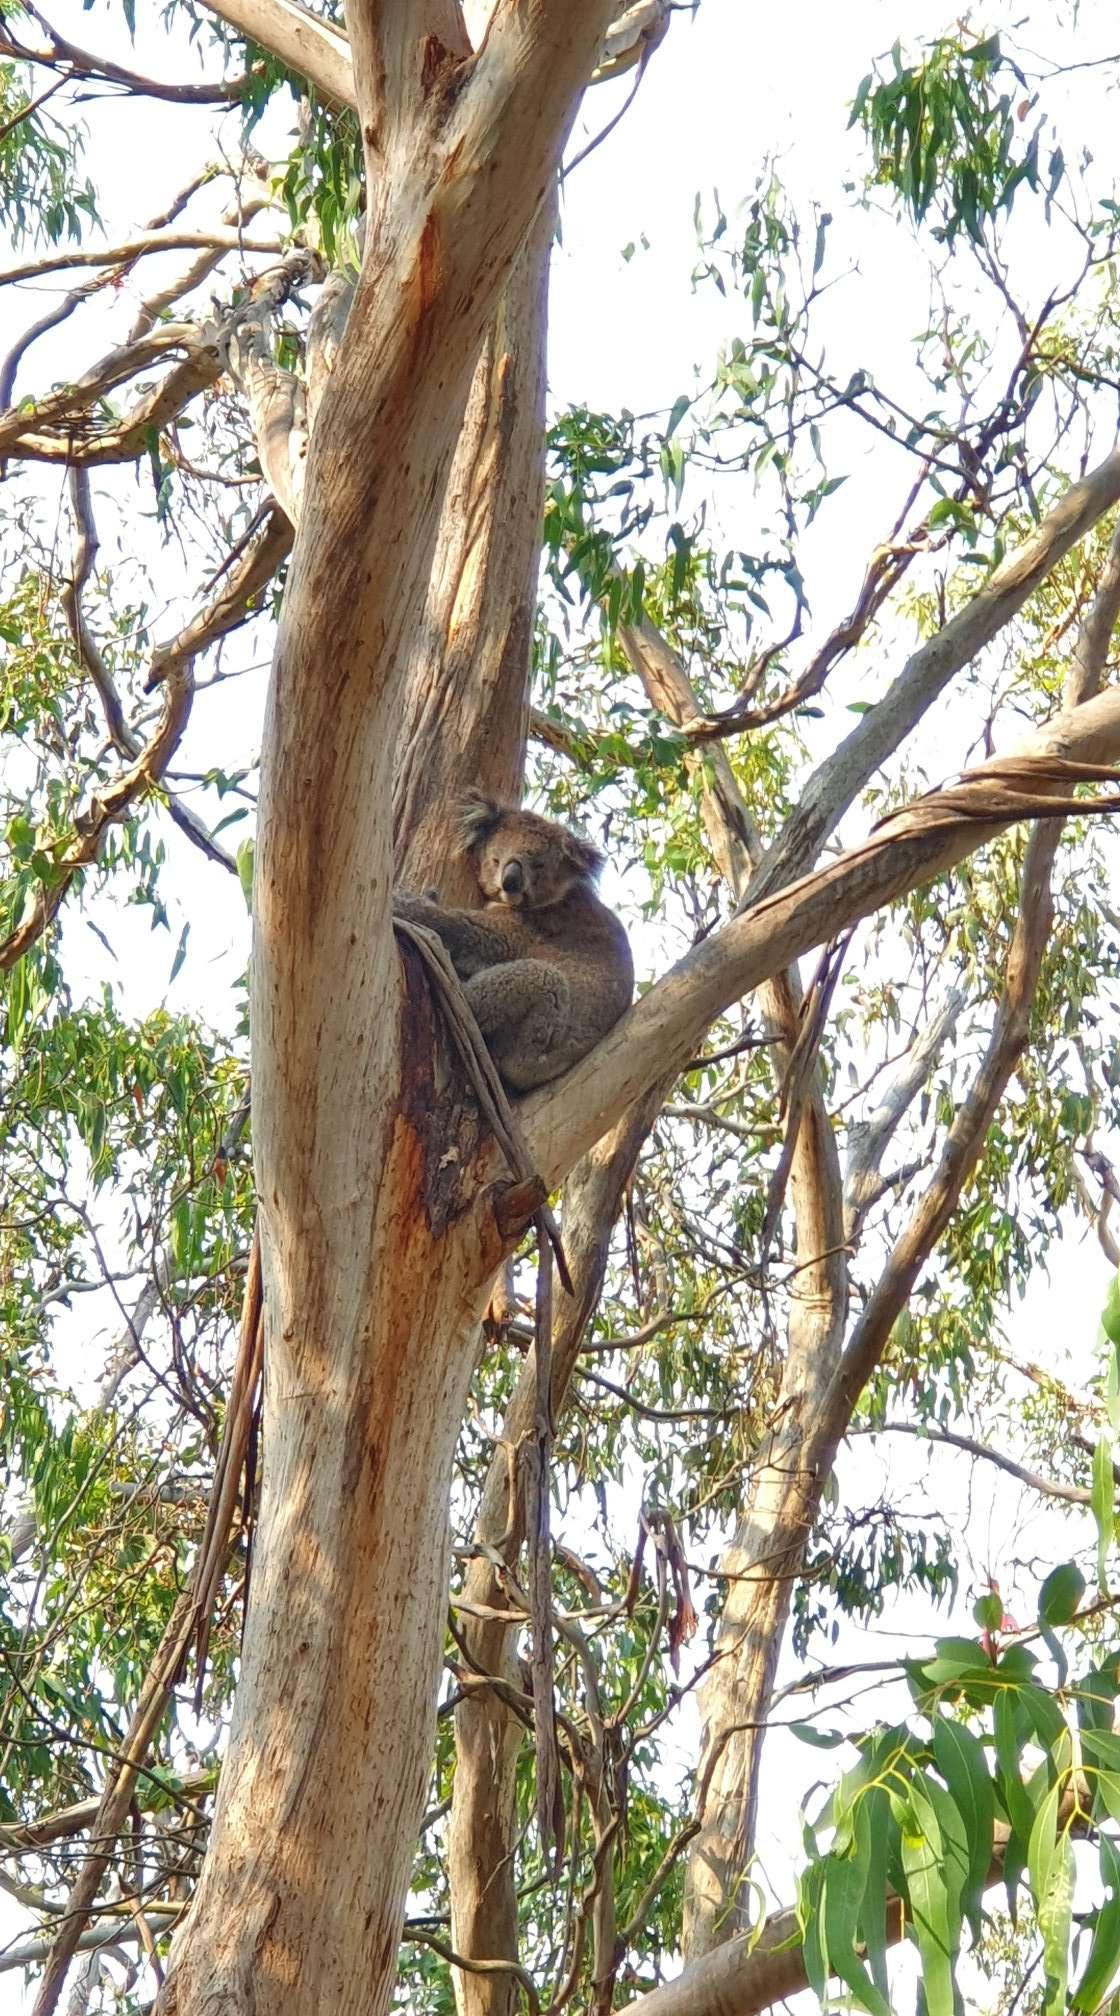 Kangaroo Point & Lookout